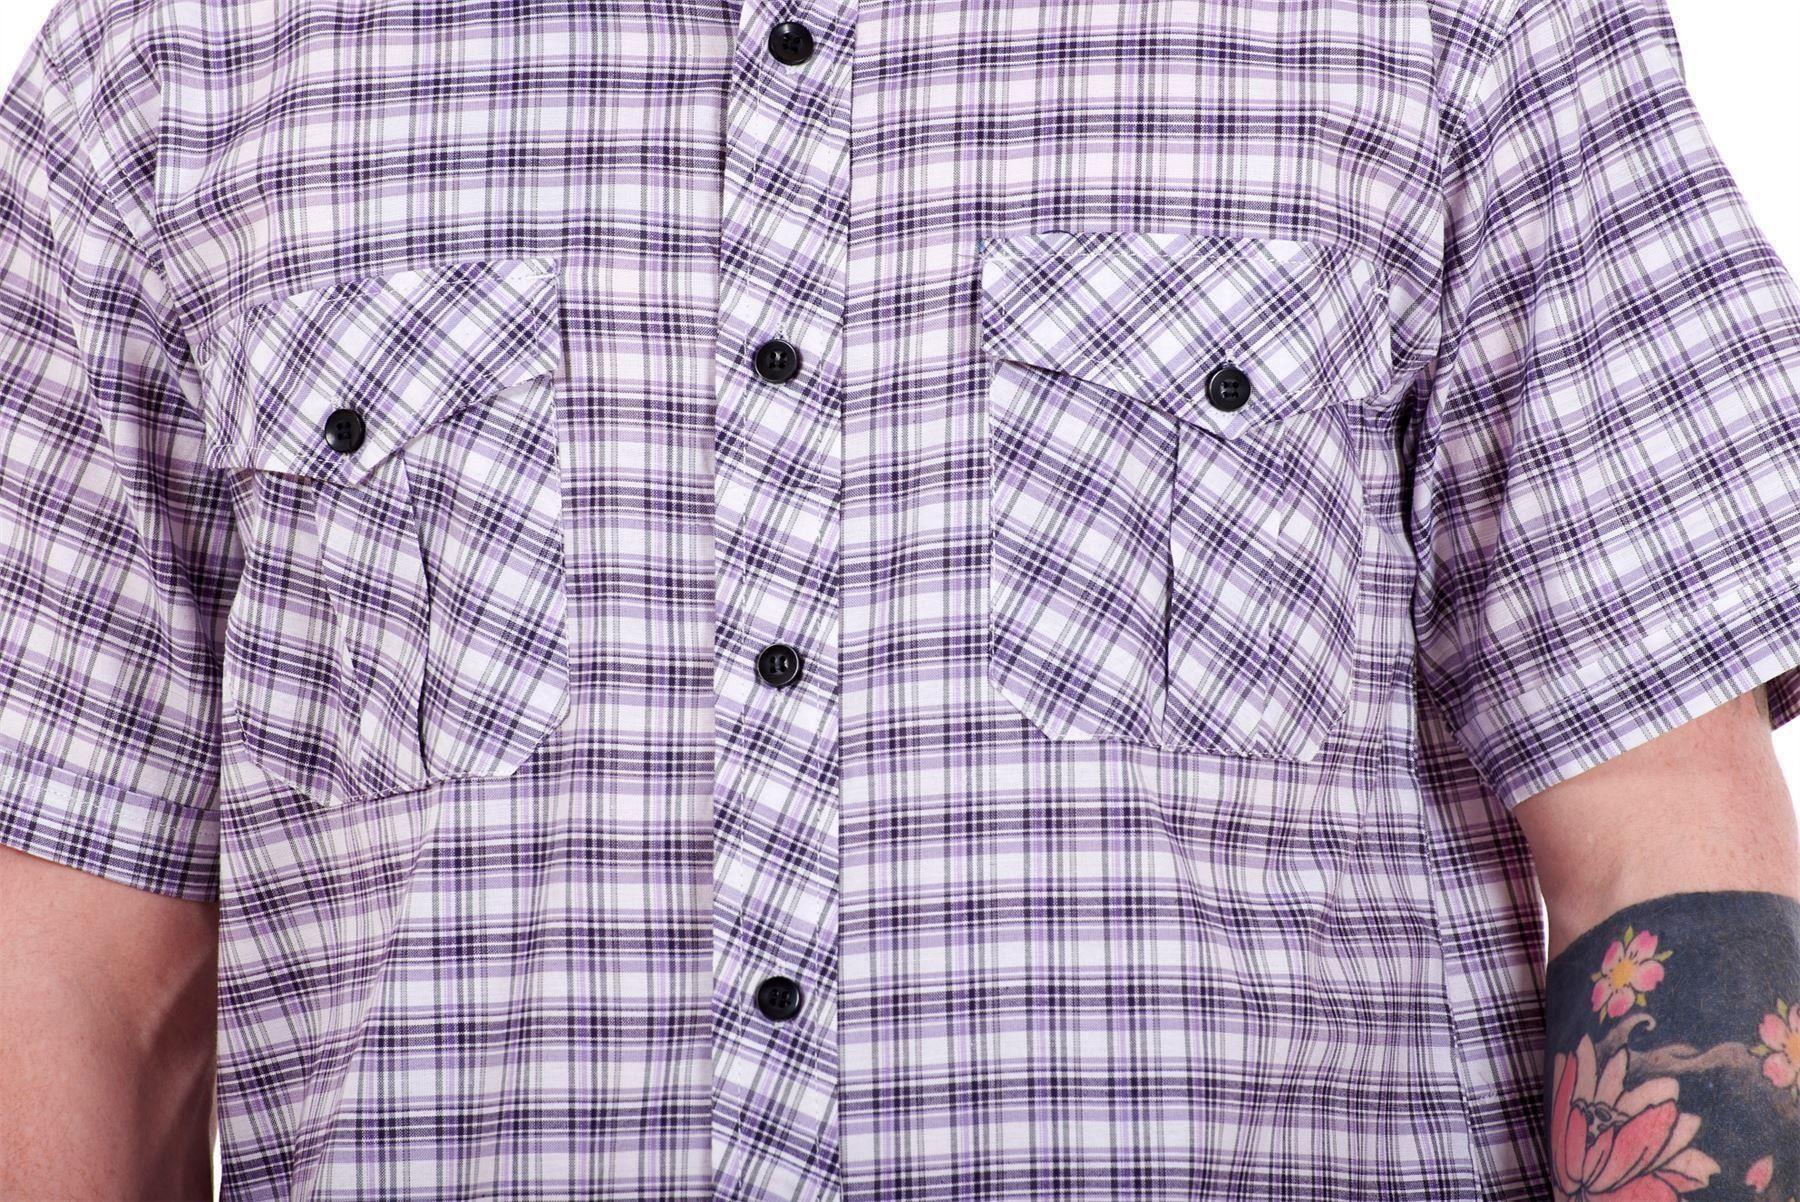 Mens-Regular-Big-Size-Shirts-Checked-Cotton-Blend-Casual-Short-Sleeve-M-to-5XL thumbnail 25